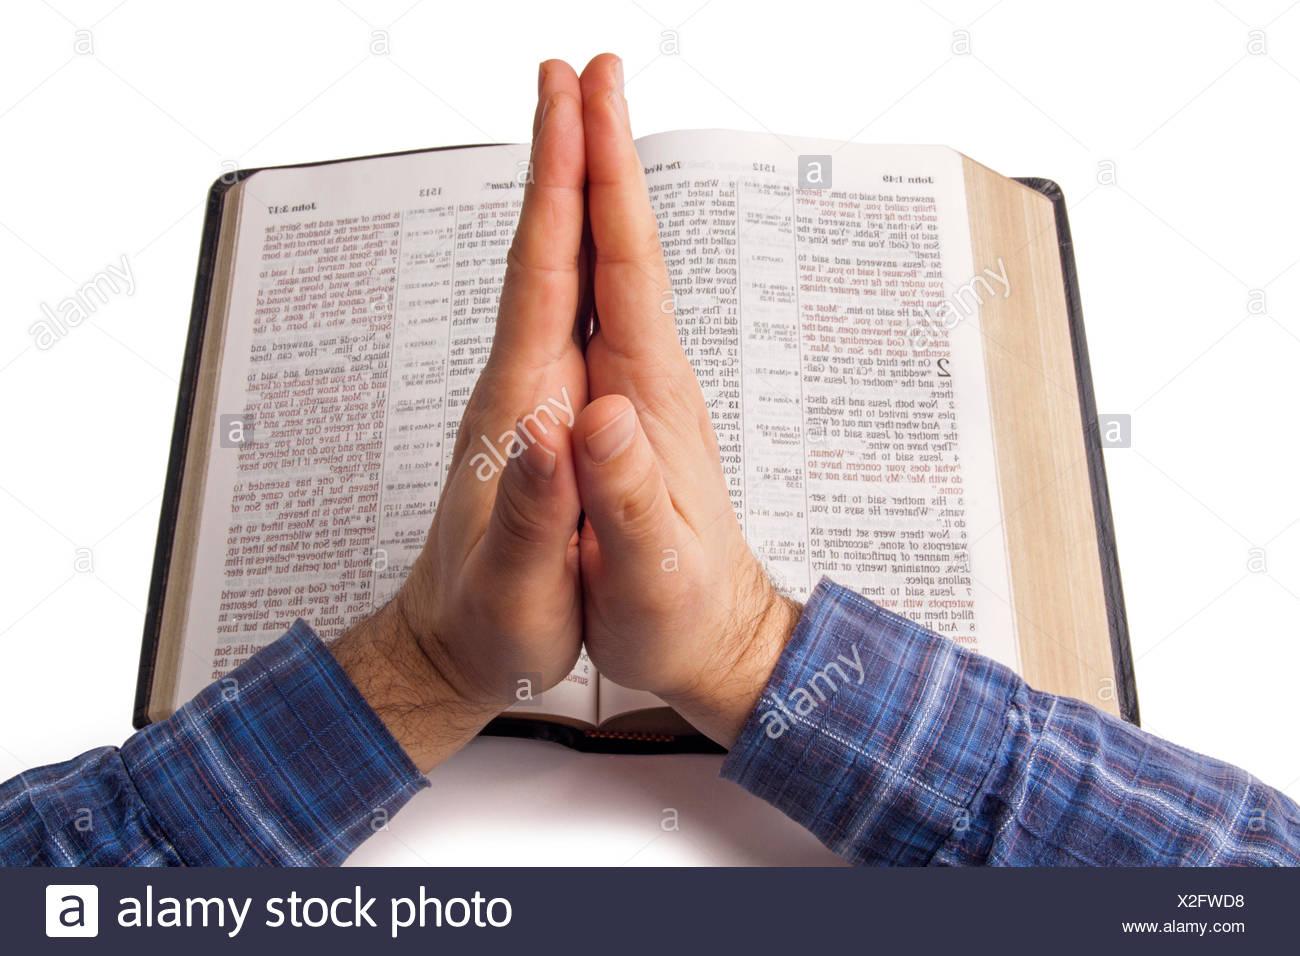 Orando Las Manos Sobre La Biblia Abierta Fotografia De Stock Alamy